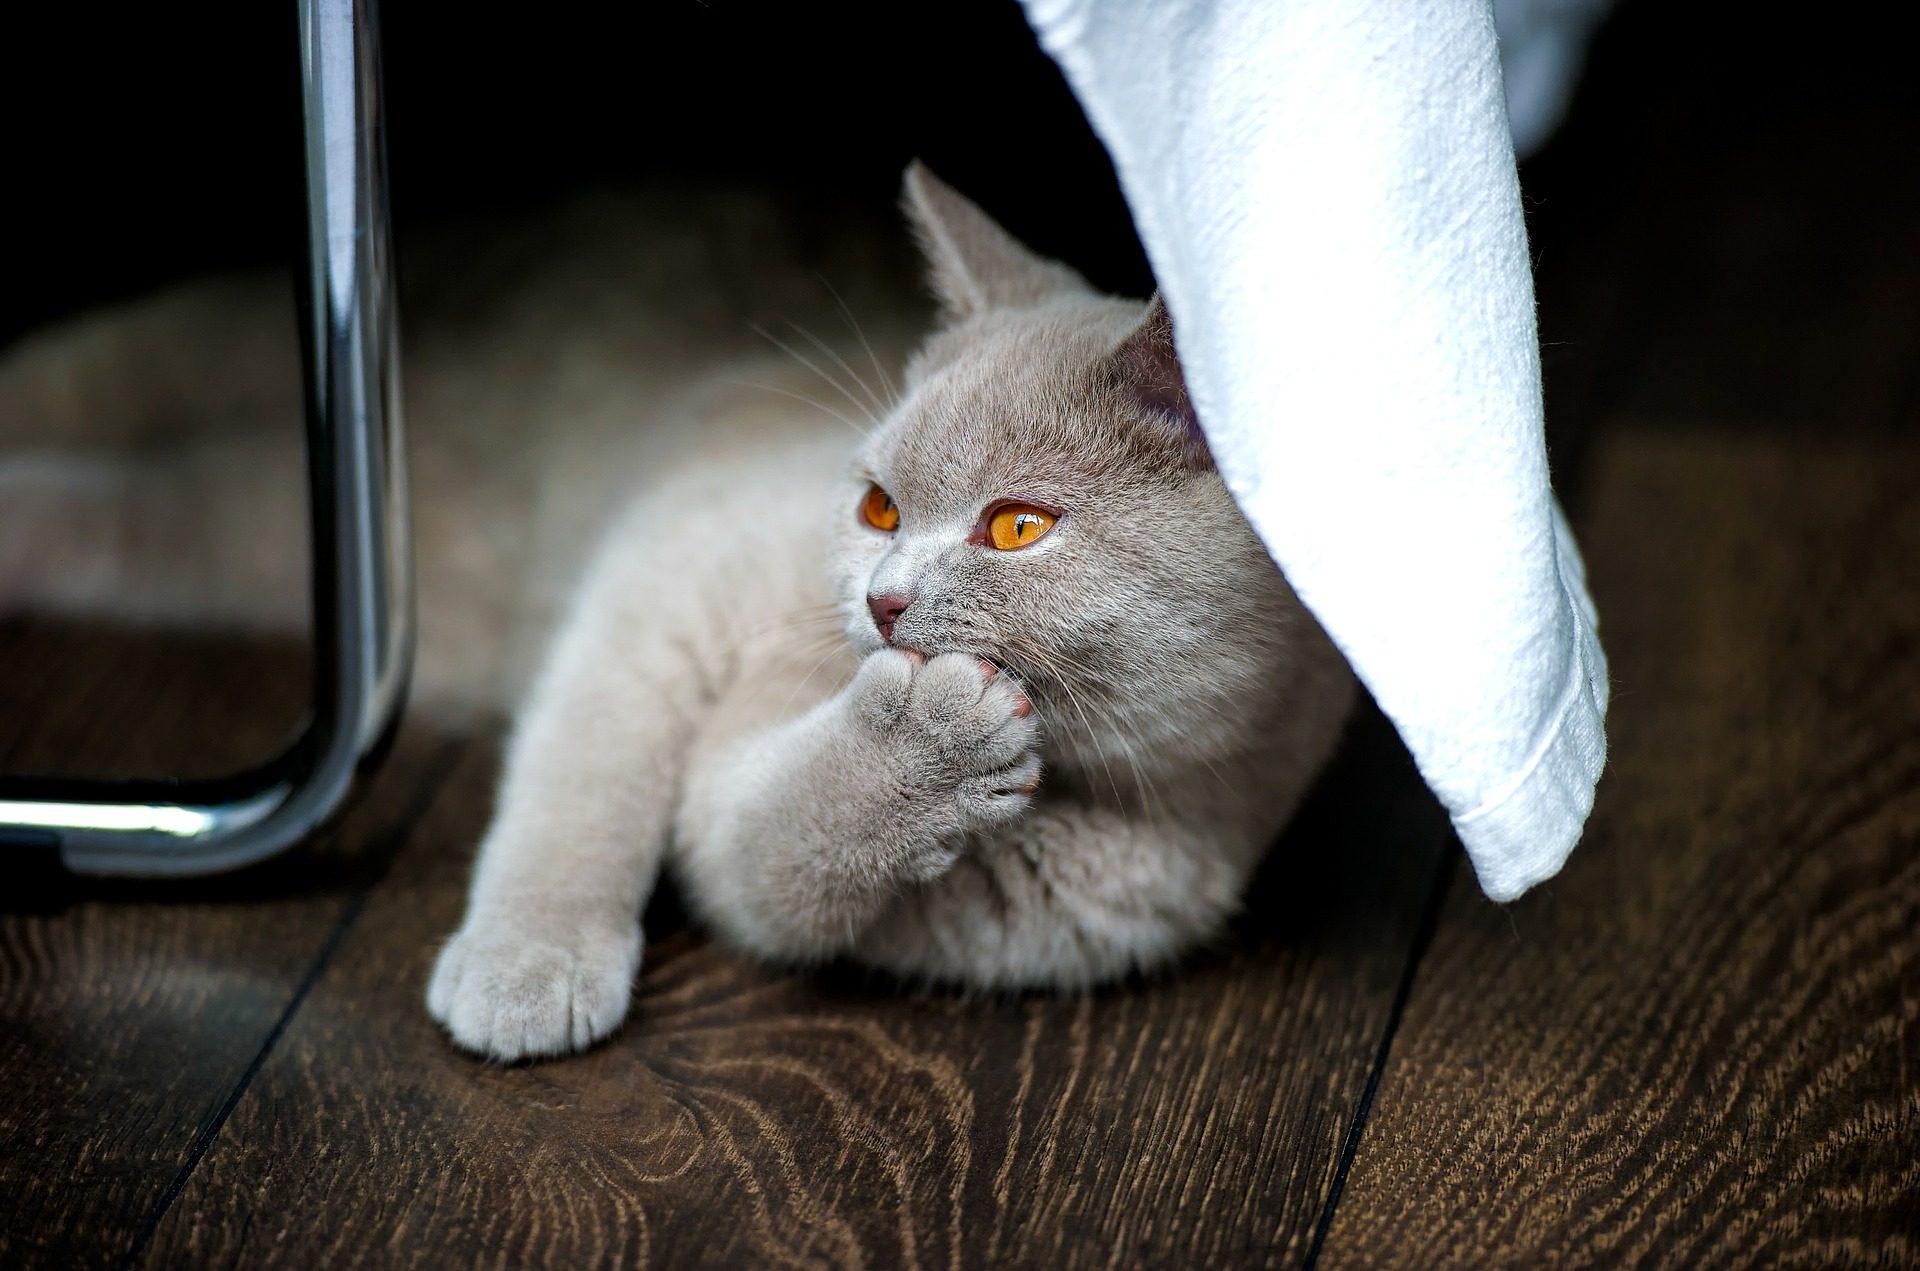 gato, Katze, Haustier, pelocorto, Blick, Augen - Wallpaper HD - Prof.-falken.com